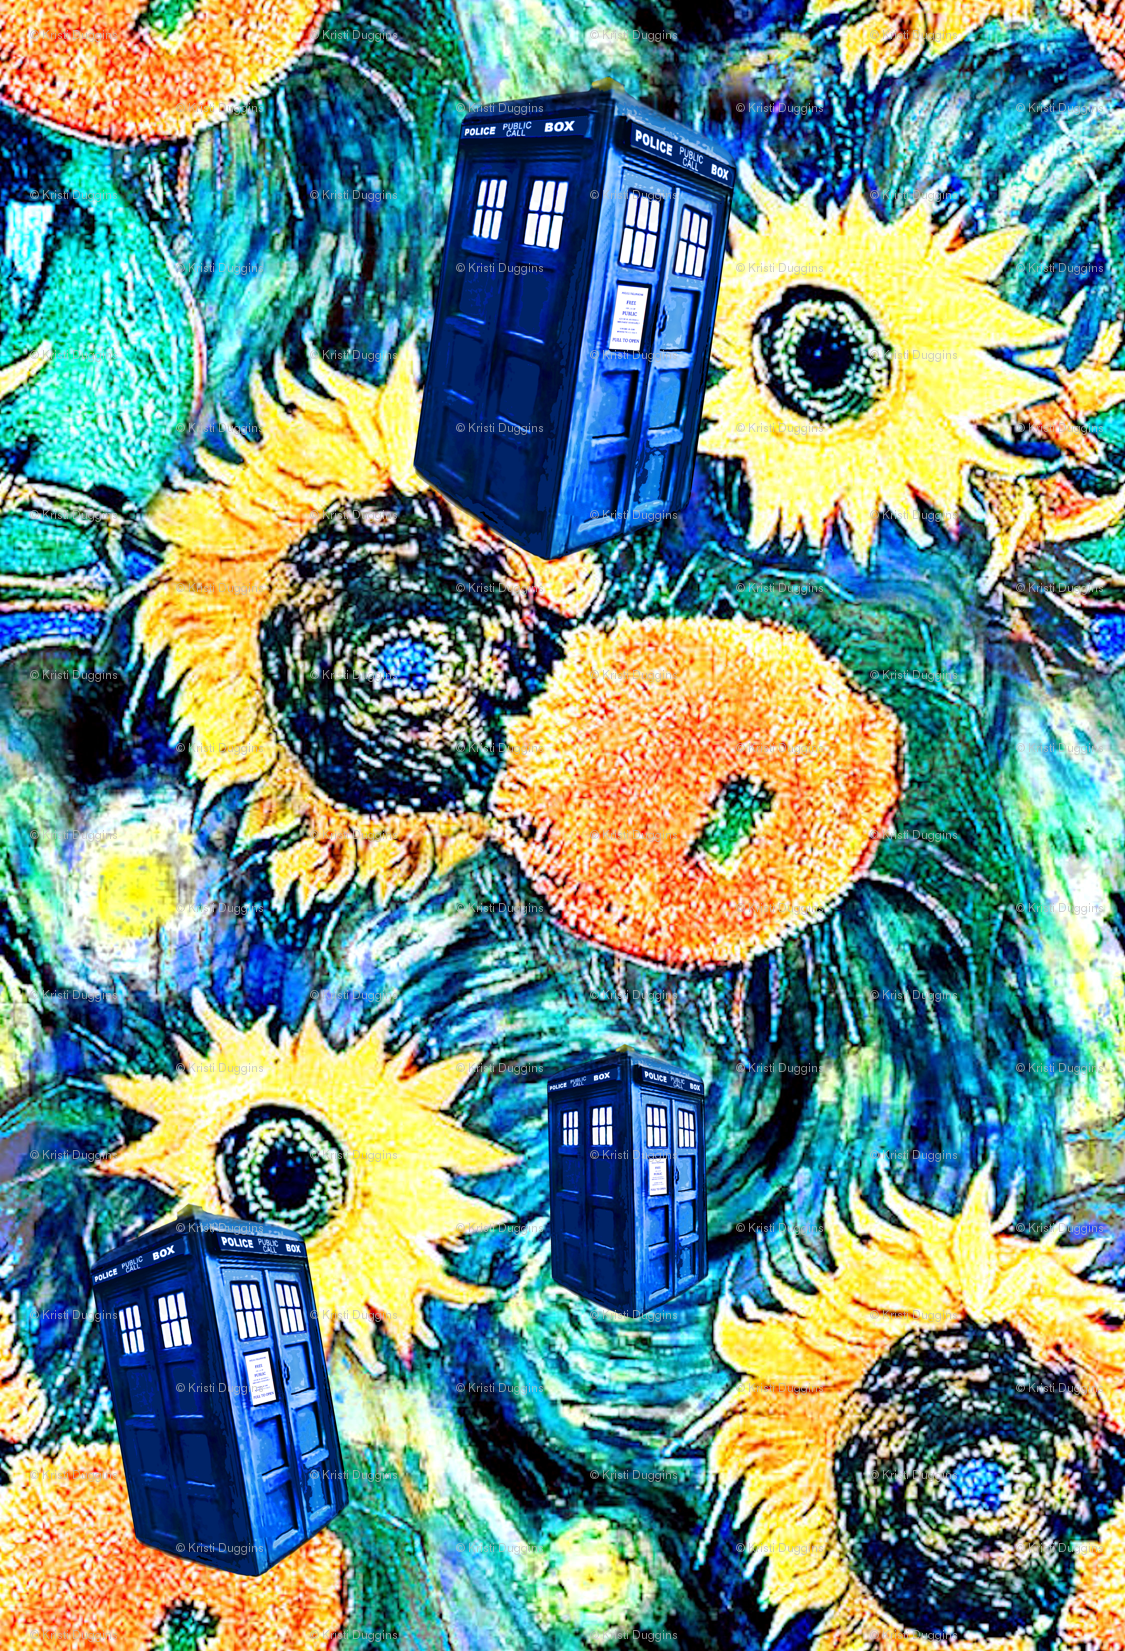 Van Gogh's Starry Night + Sunflowers Police Box wallpaper - bohobear - Spoonflower